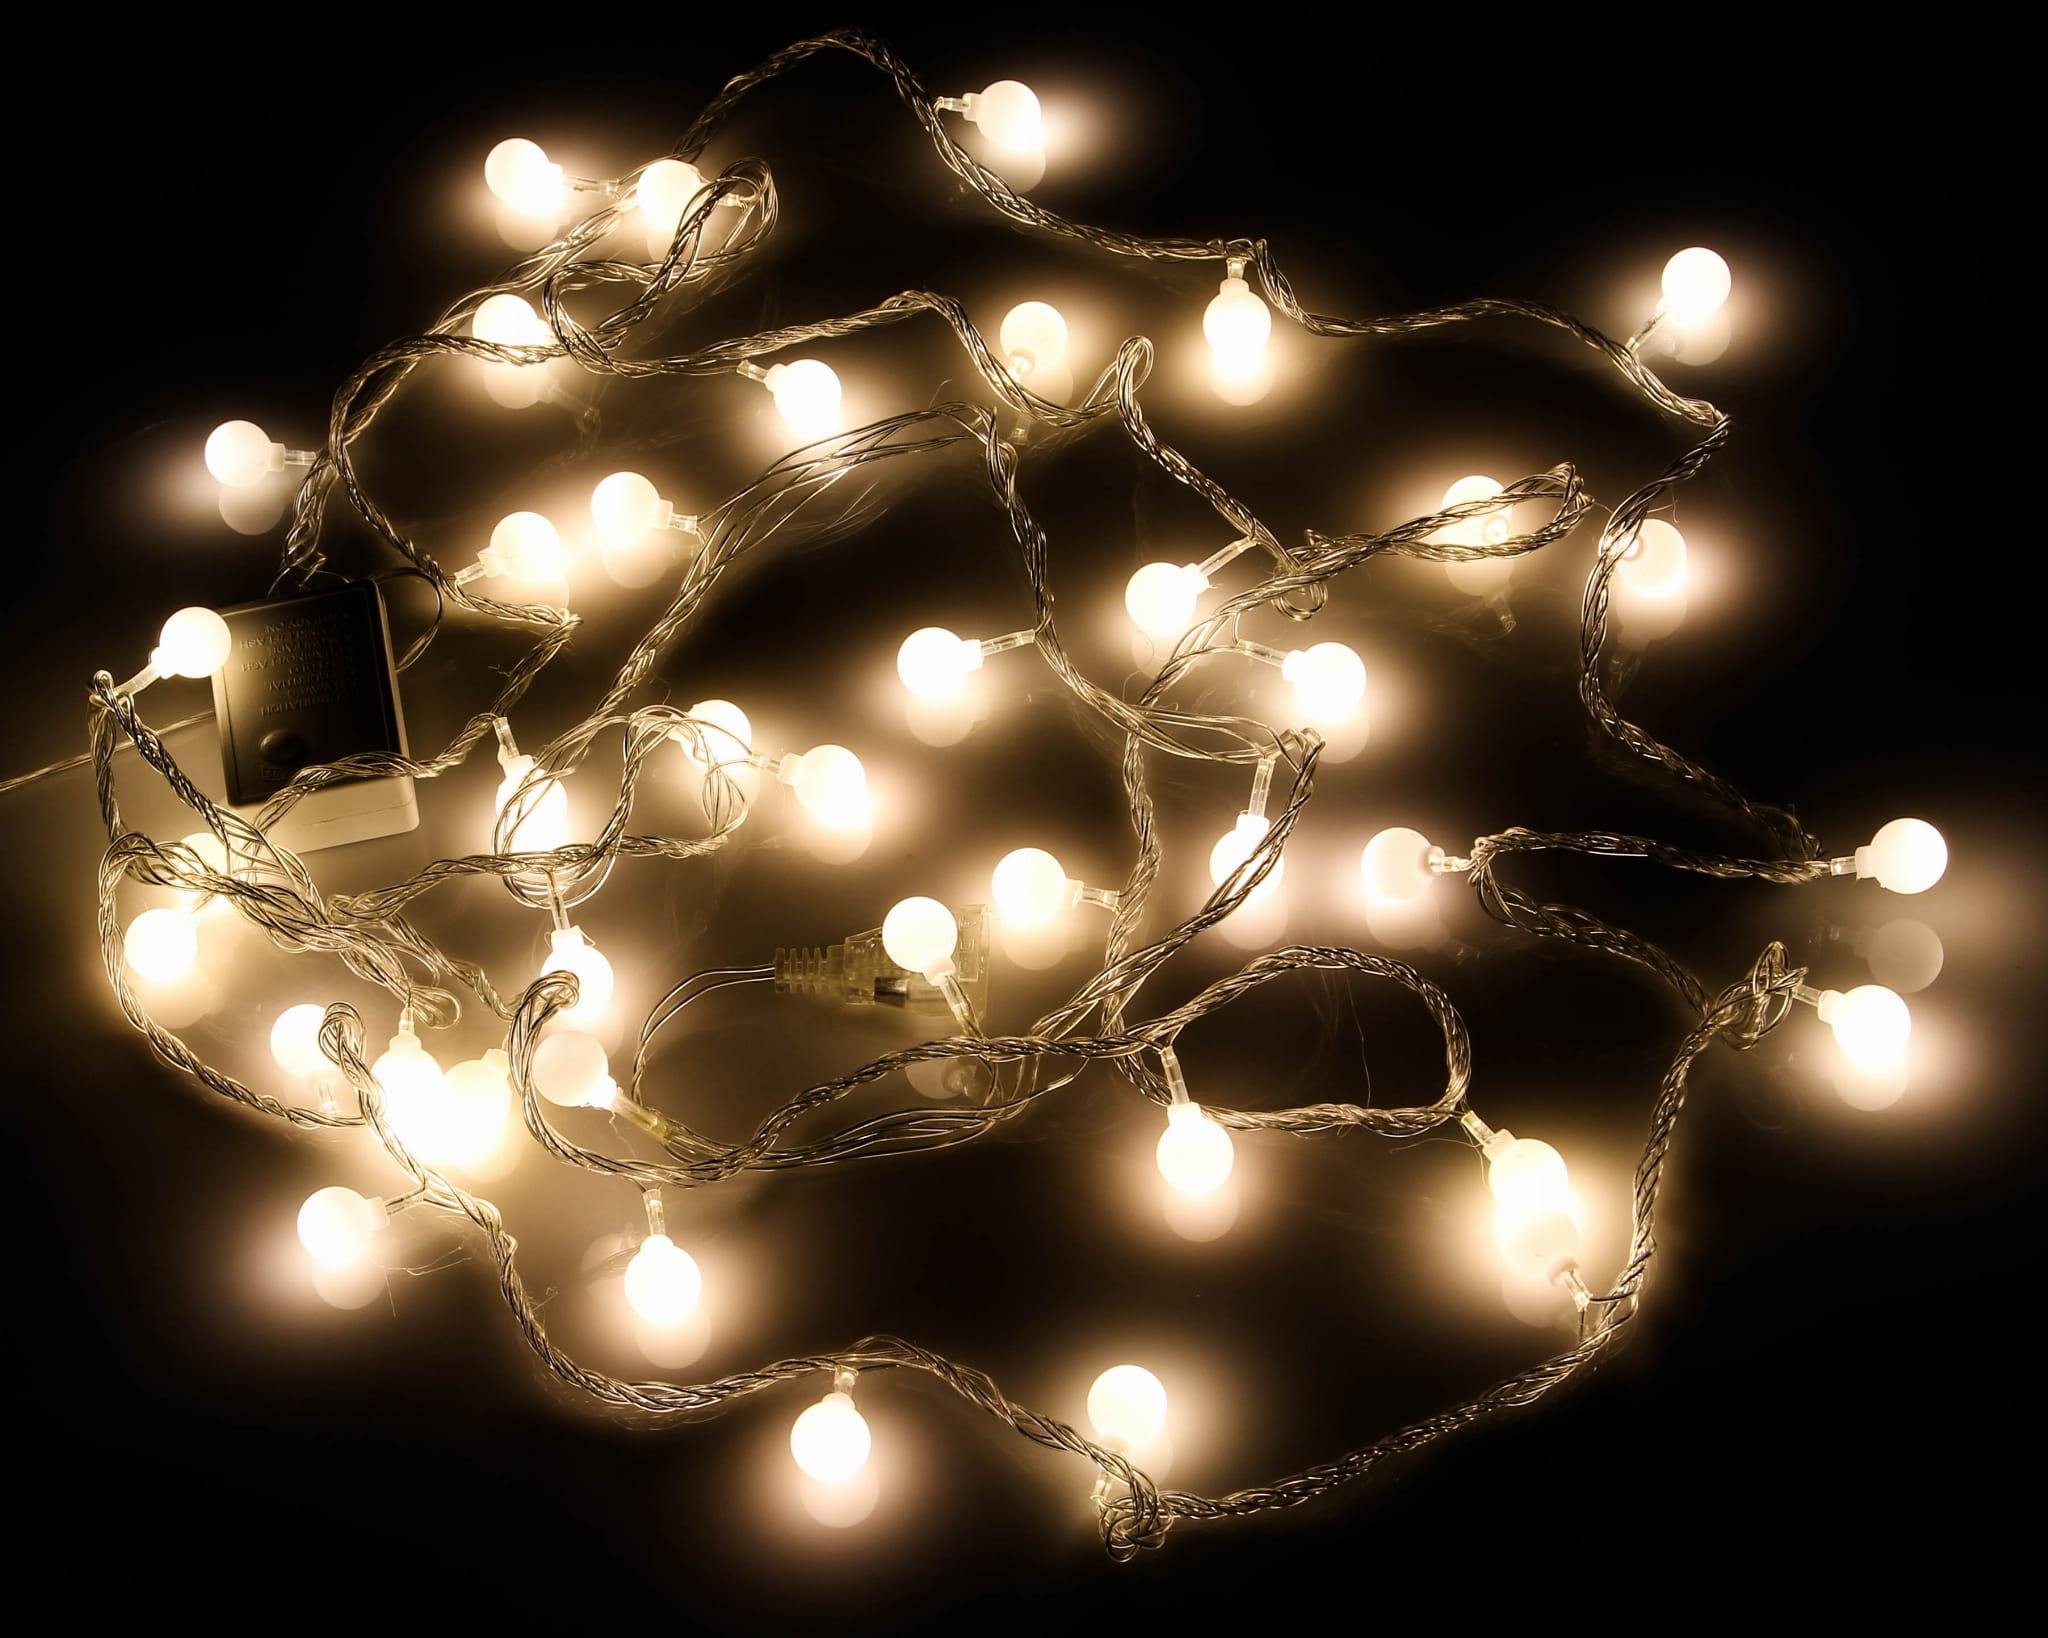 Lampki 40led Ciepła Biel 6m Joylight Ip44 Dekoracyjna Girlanda Kulki Ledowe Do Domu I Ogrodu